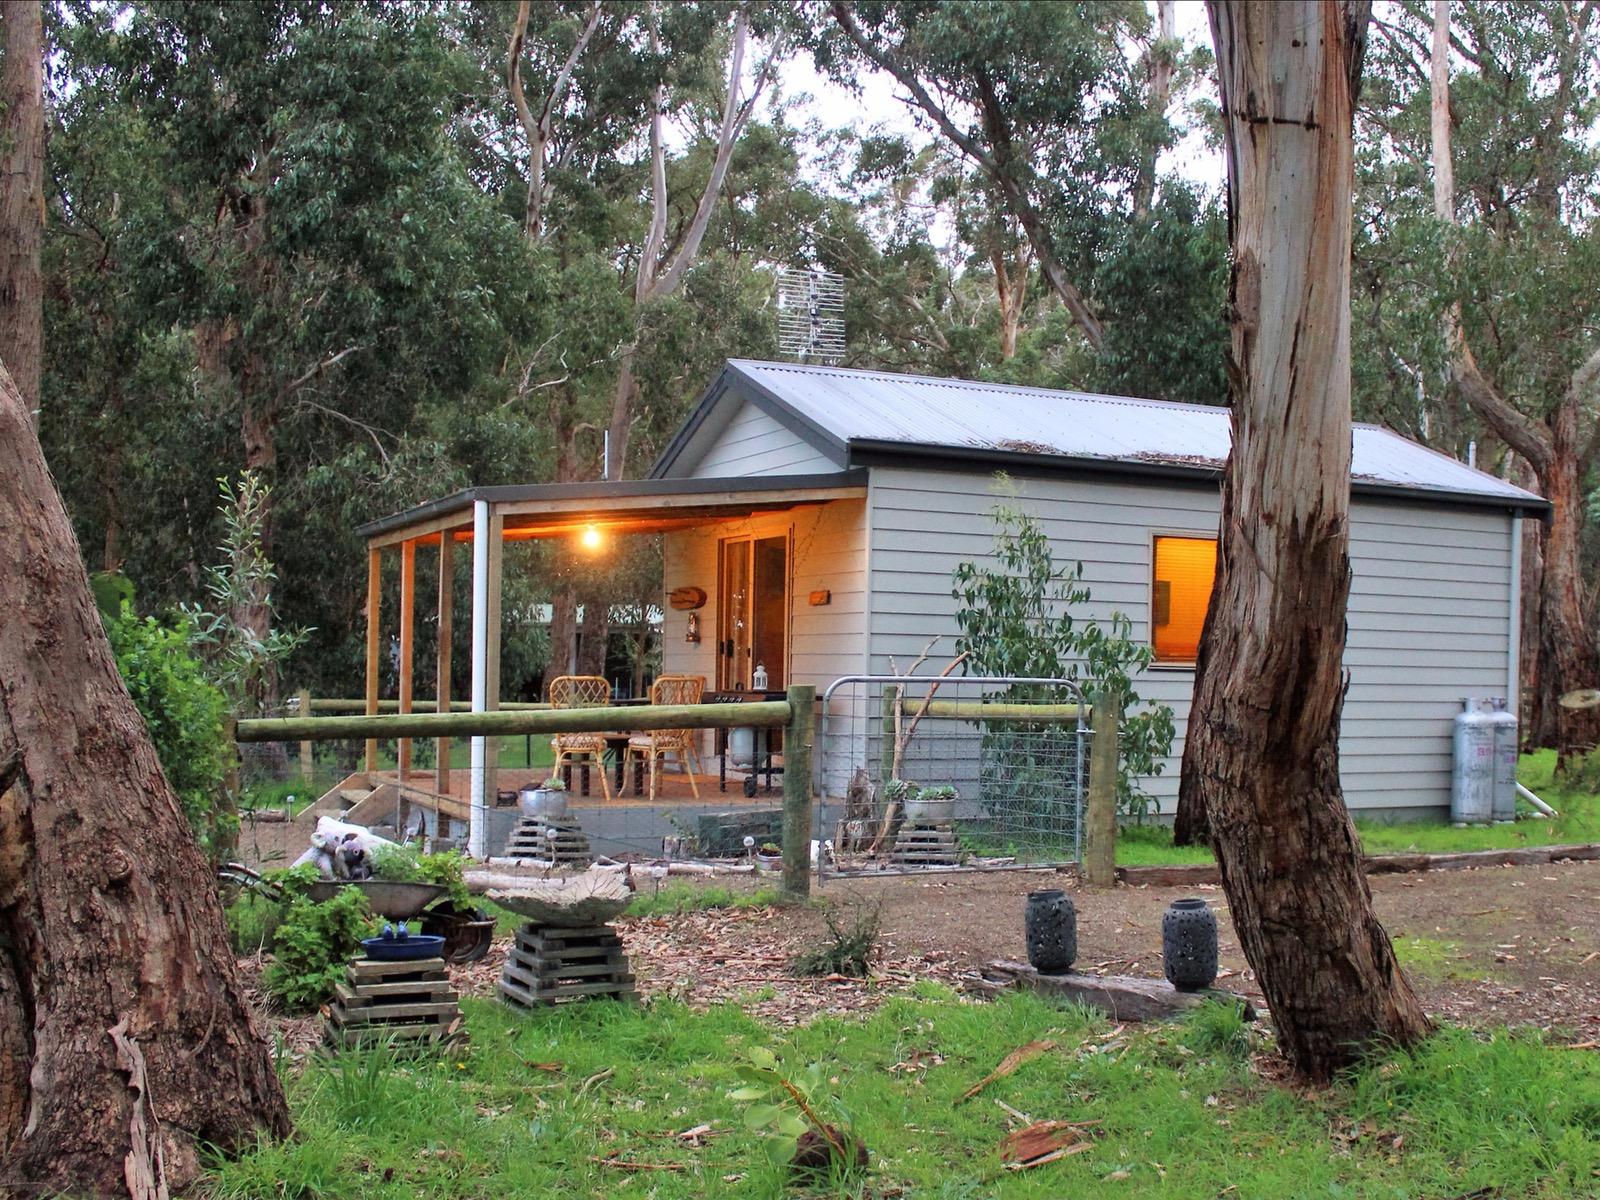 Image of cabin and surrounding bushland